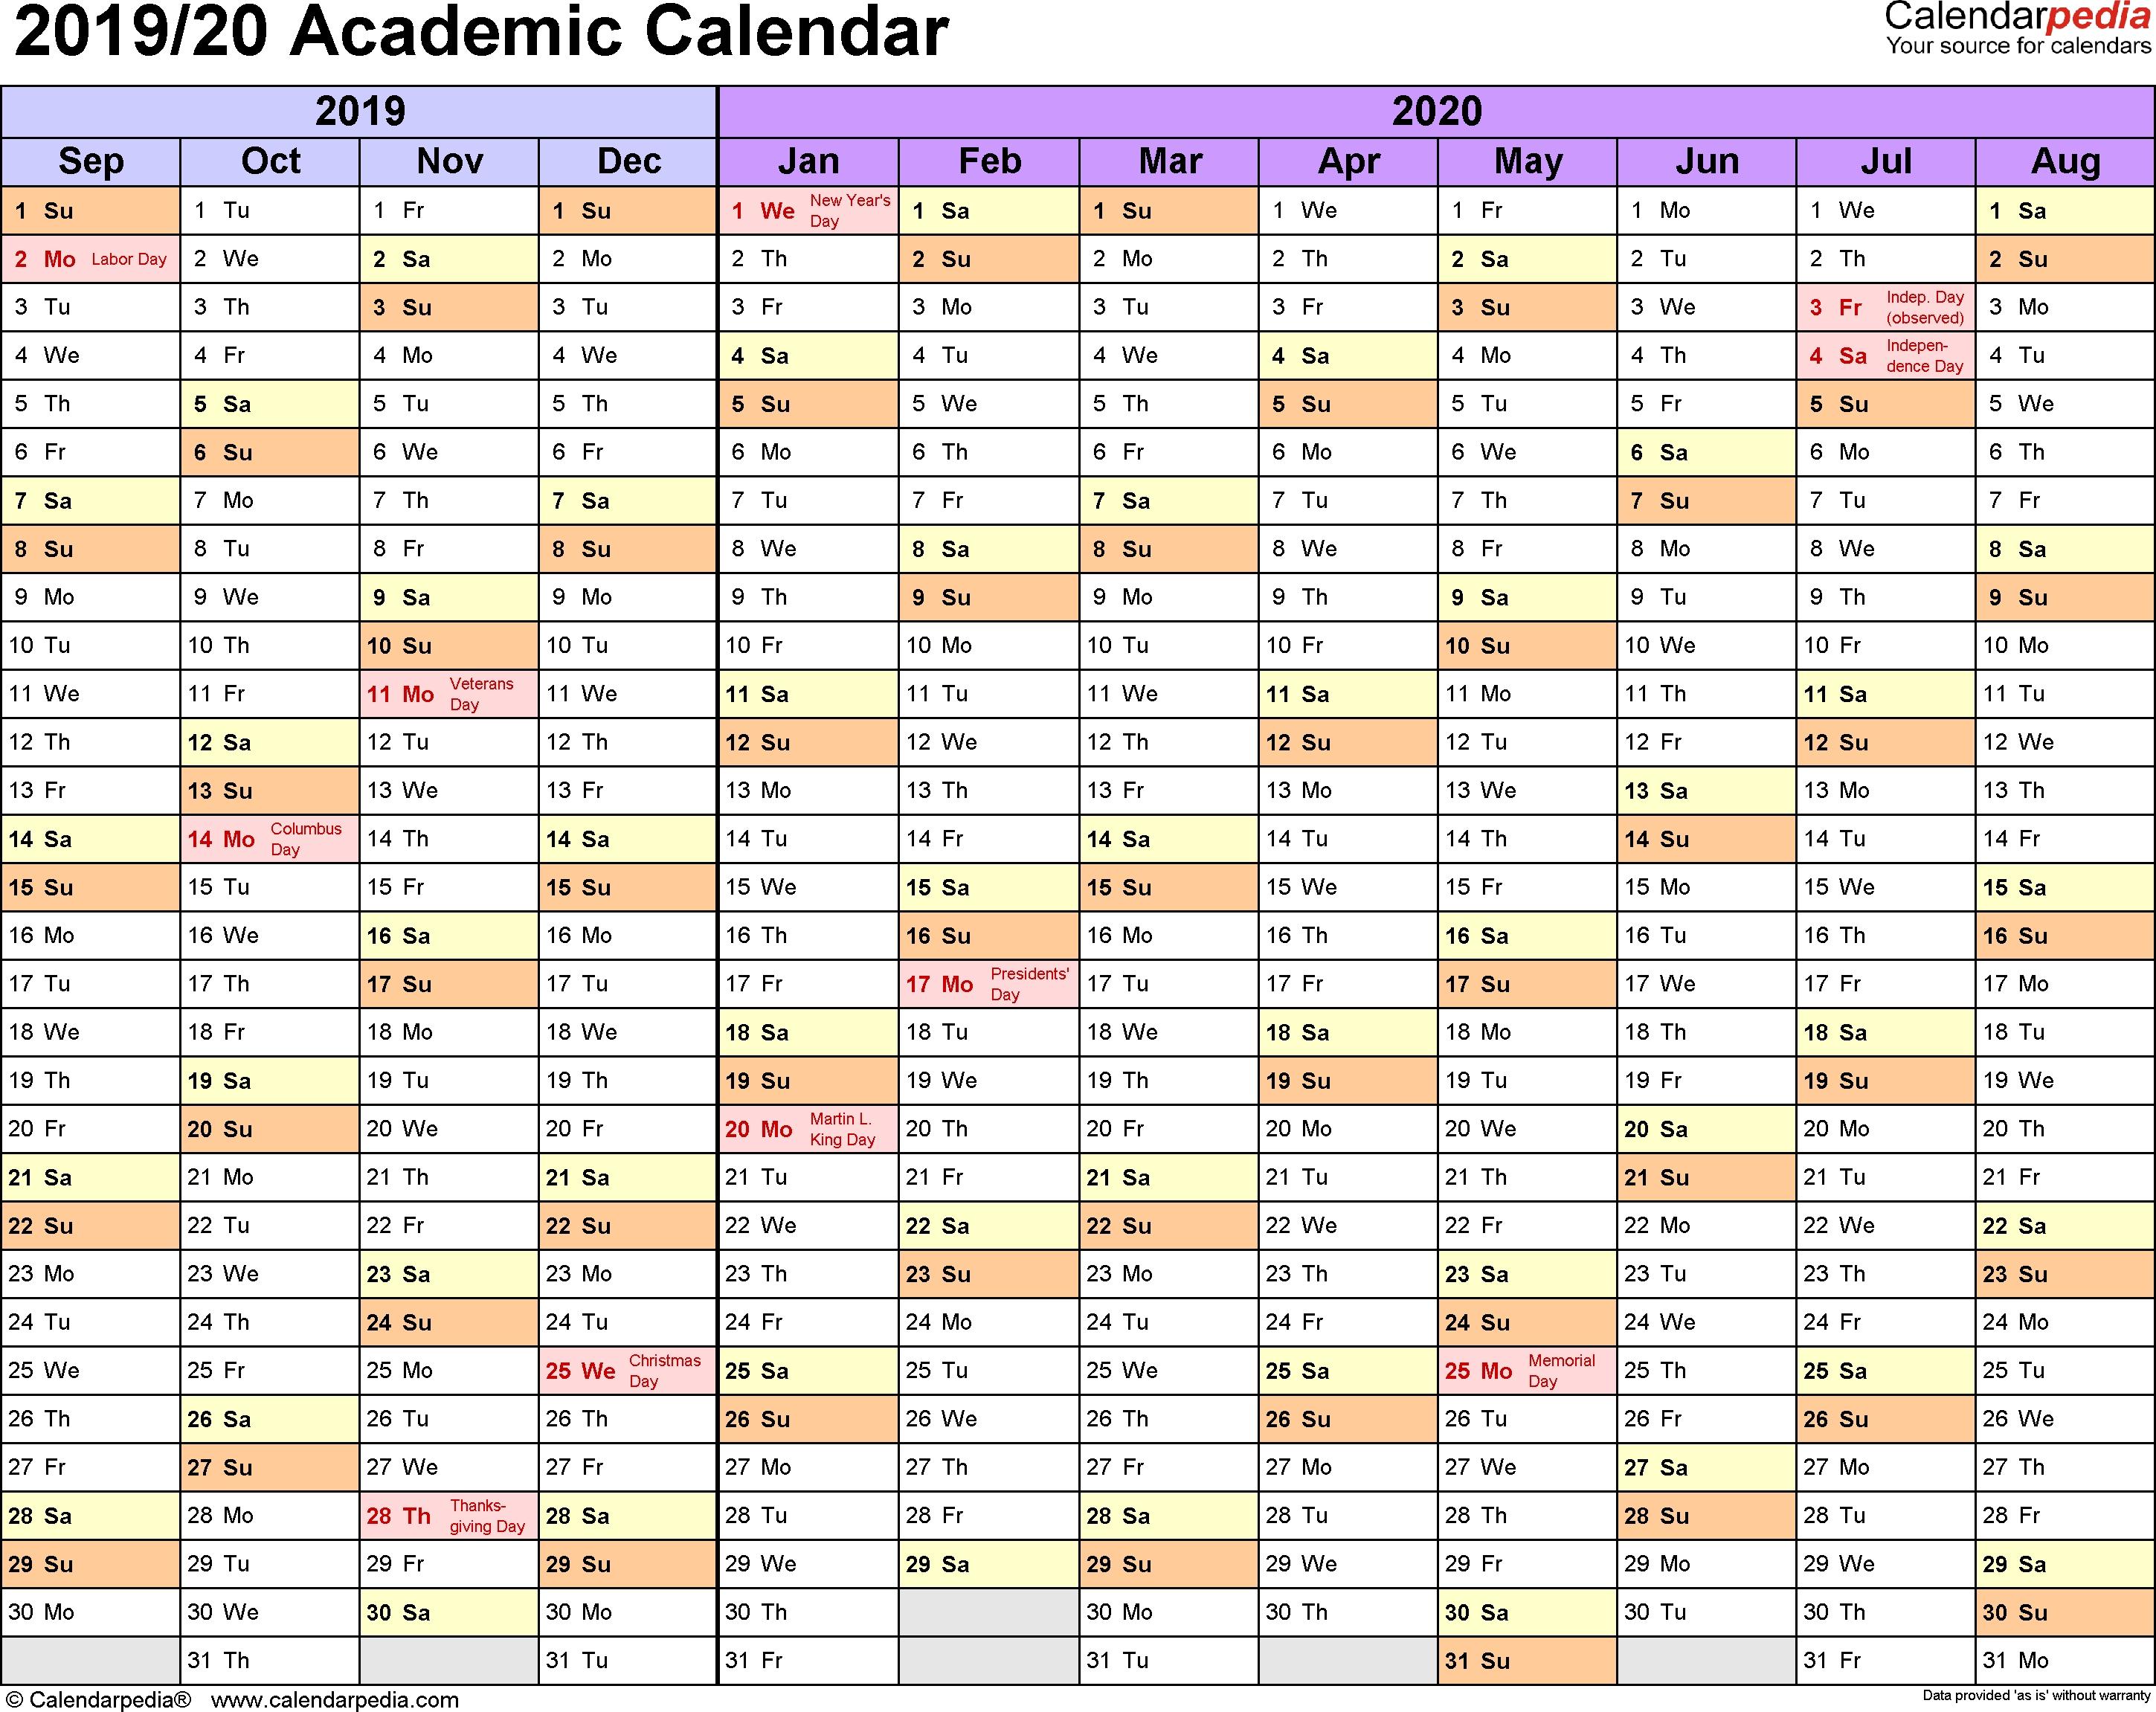 Academic Calendars 2019/2020 - Free Printable Excel Templates_Blank Horizontal Calendar 2020